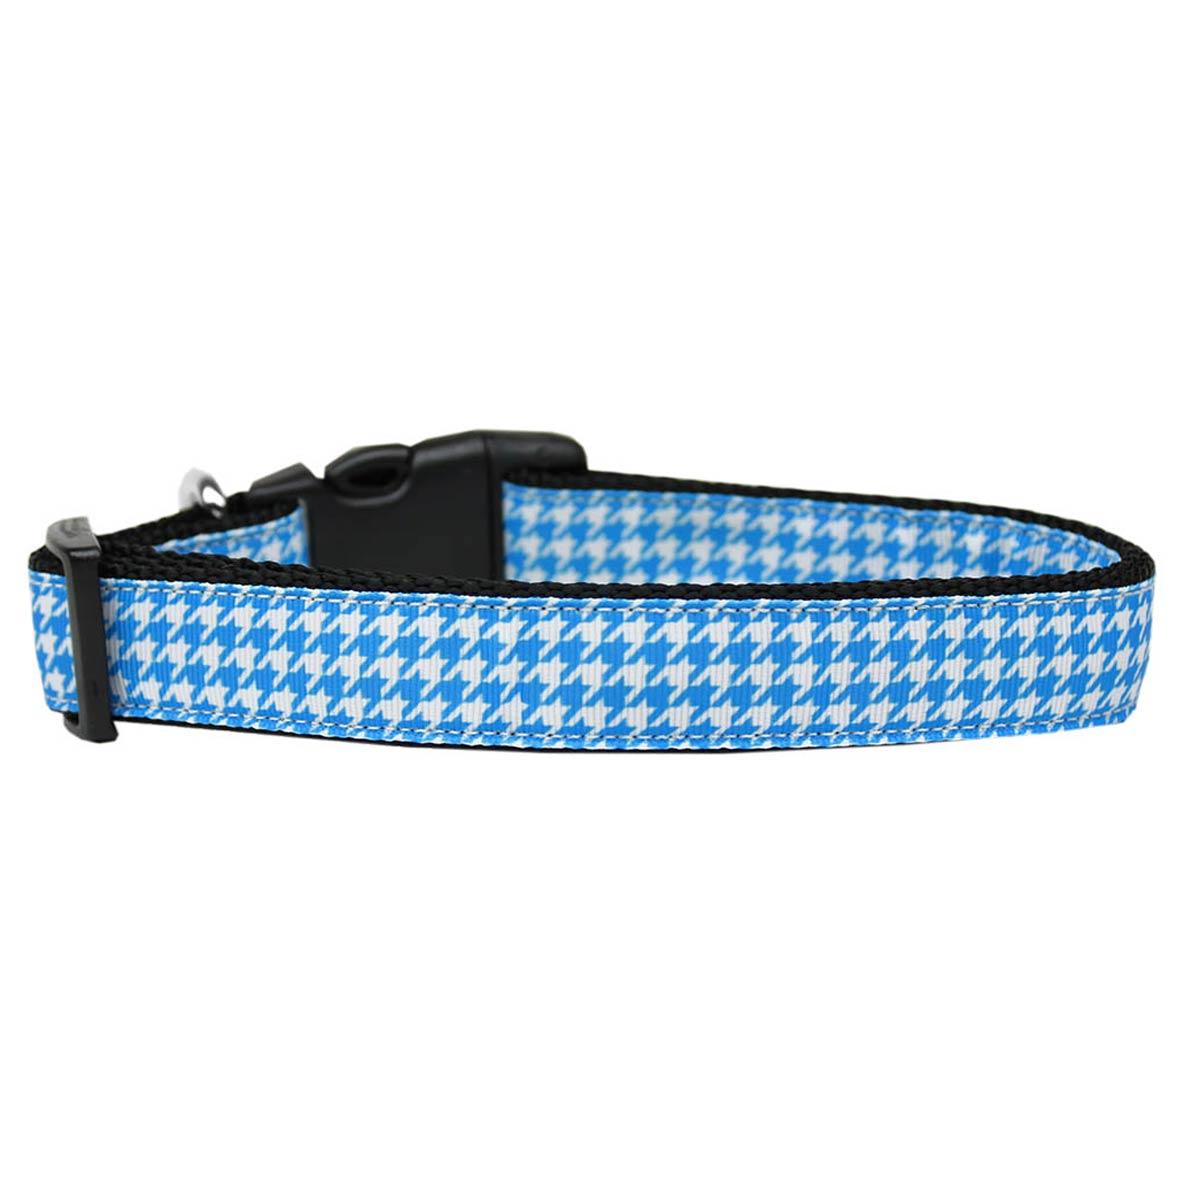 Houndstooth Nylon Dog Collar - Blue